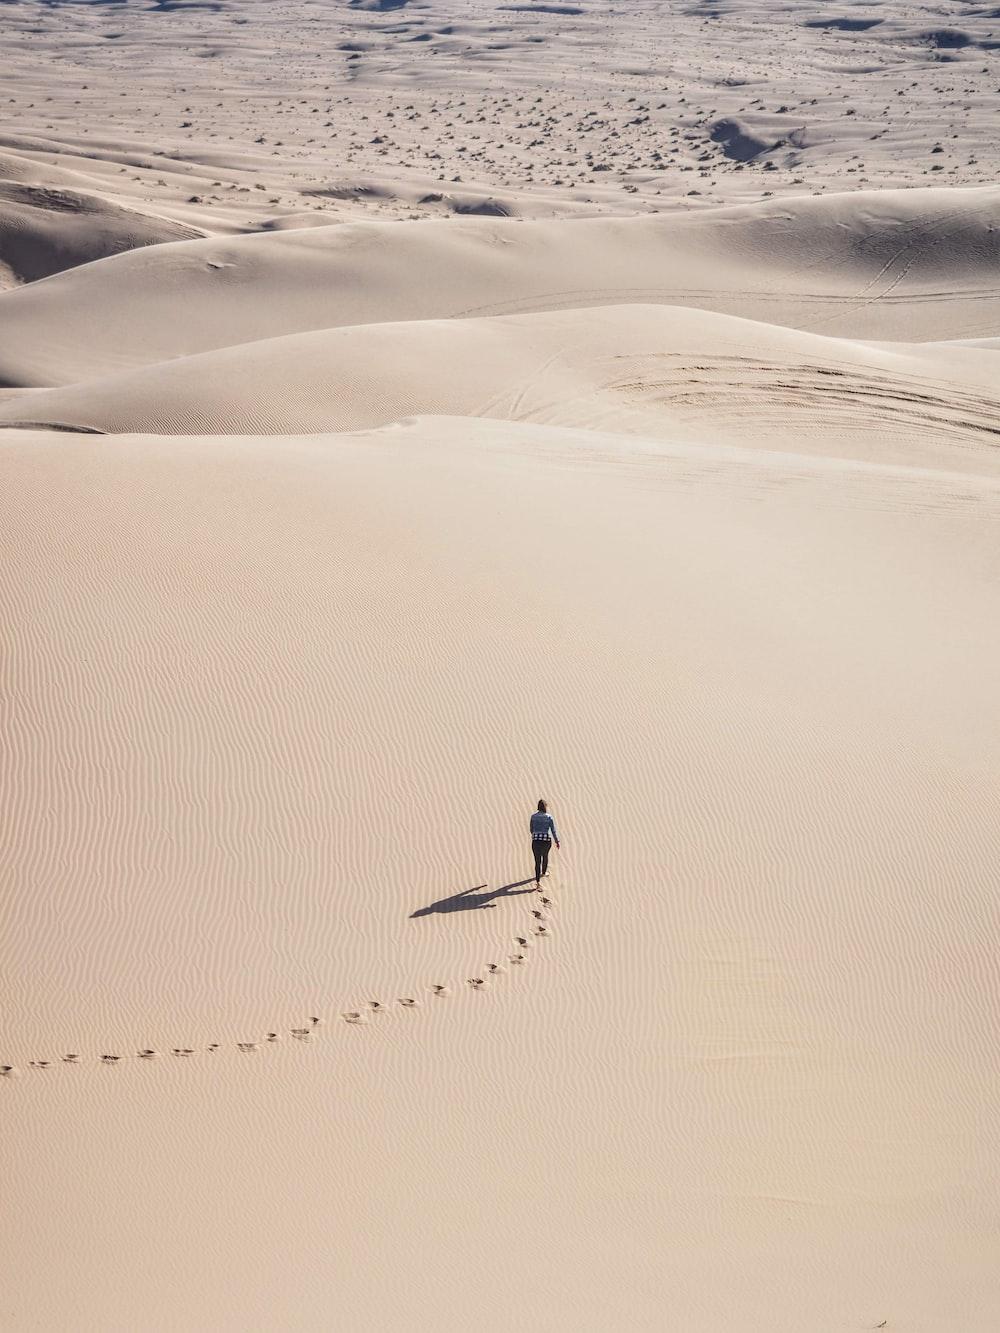 person walking on desert sand during daytime